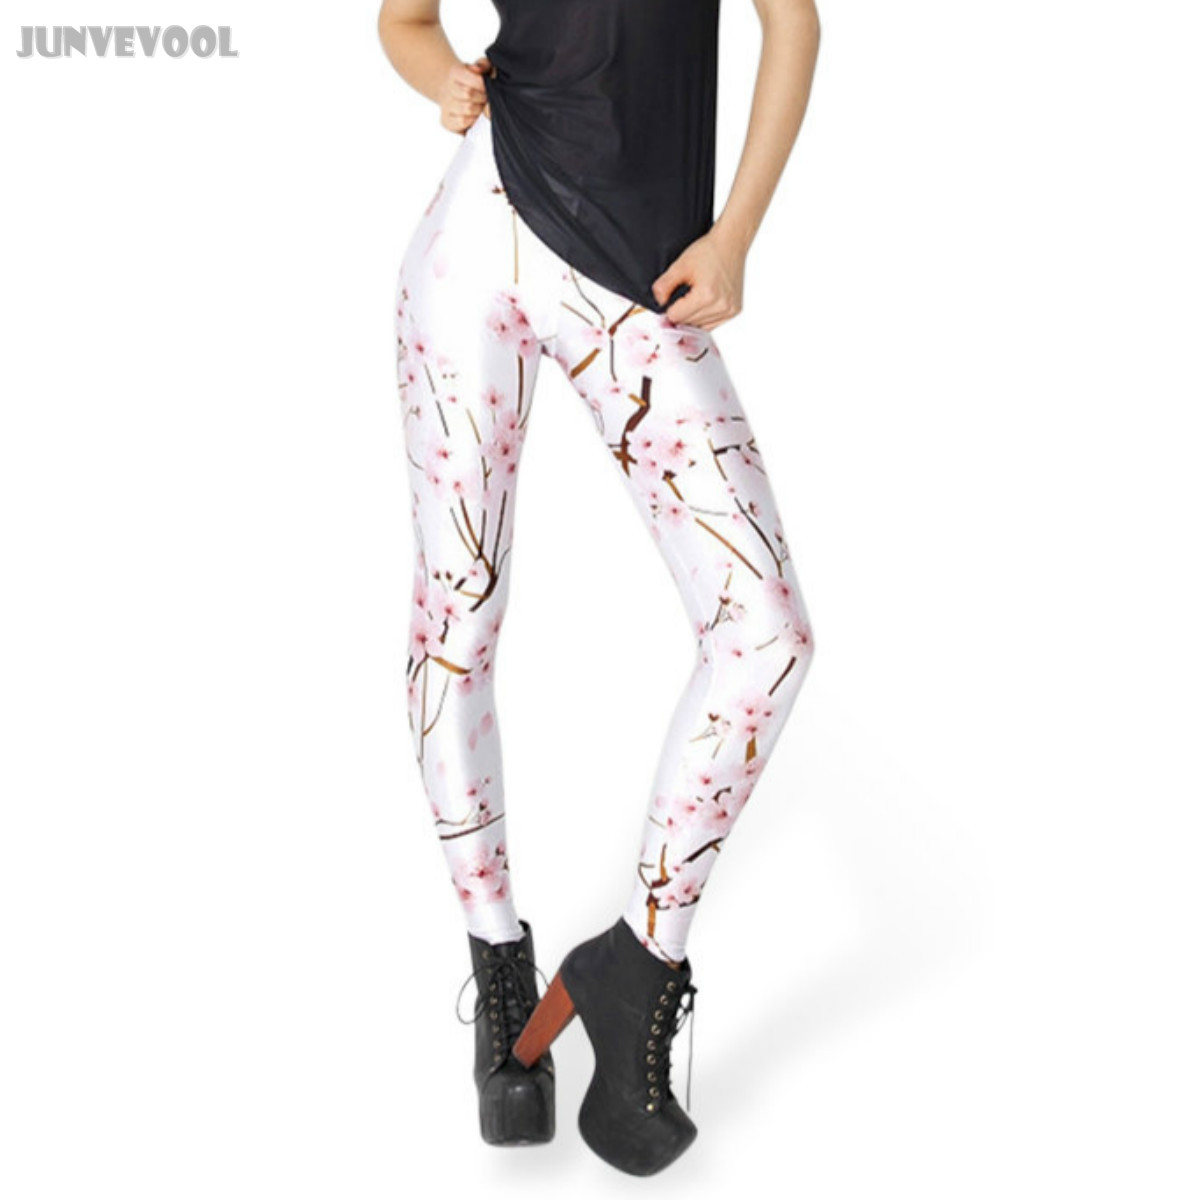 ③Mujeres entrenamientos Pantalones Pink Plum digital impreso ...